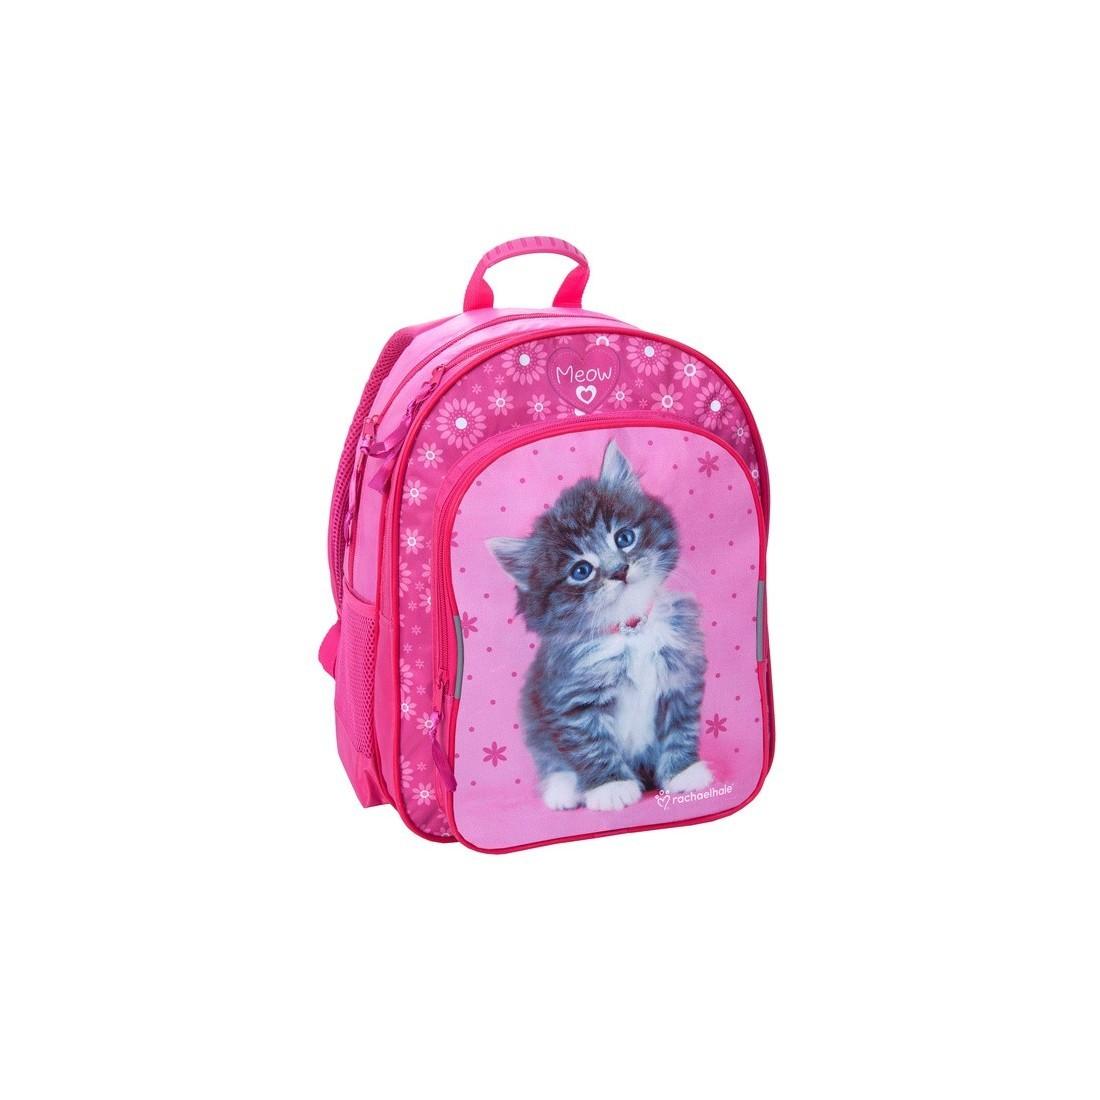 Plecak Rachael Hale z kotkiem - plecak-tornister.pl